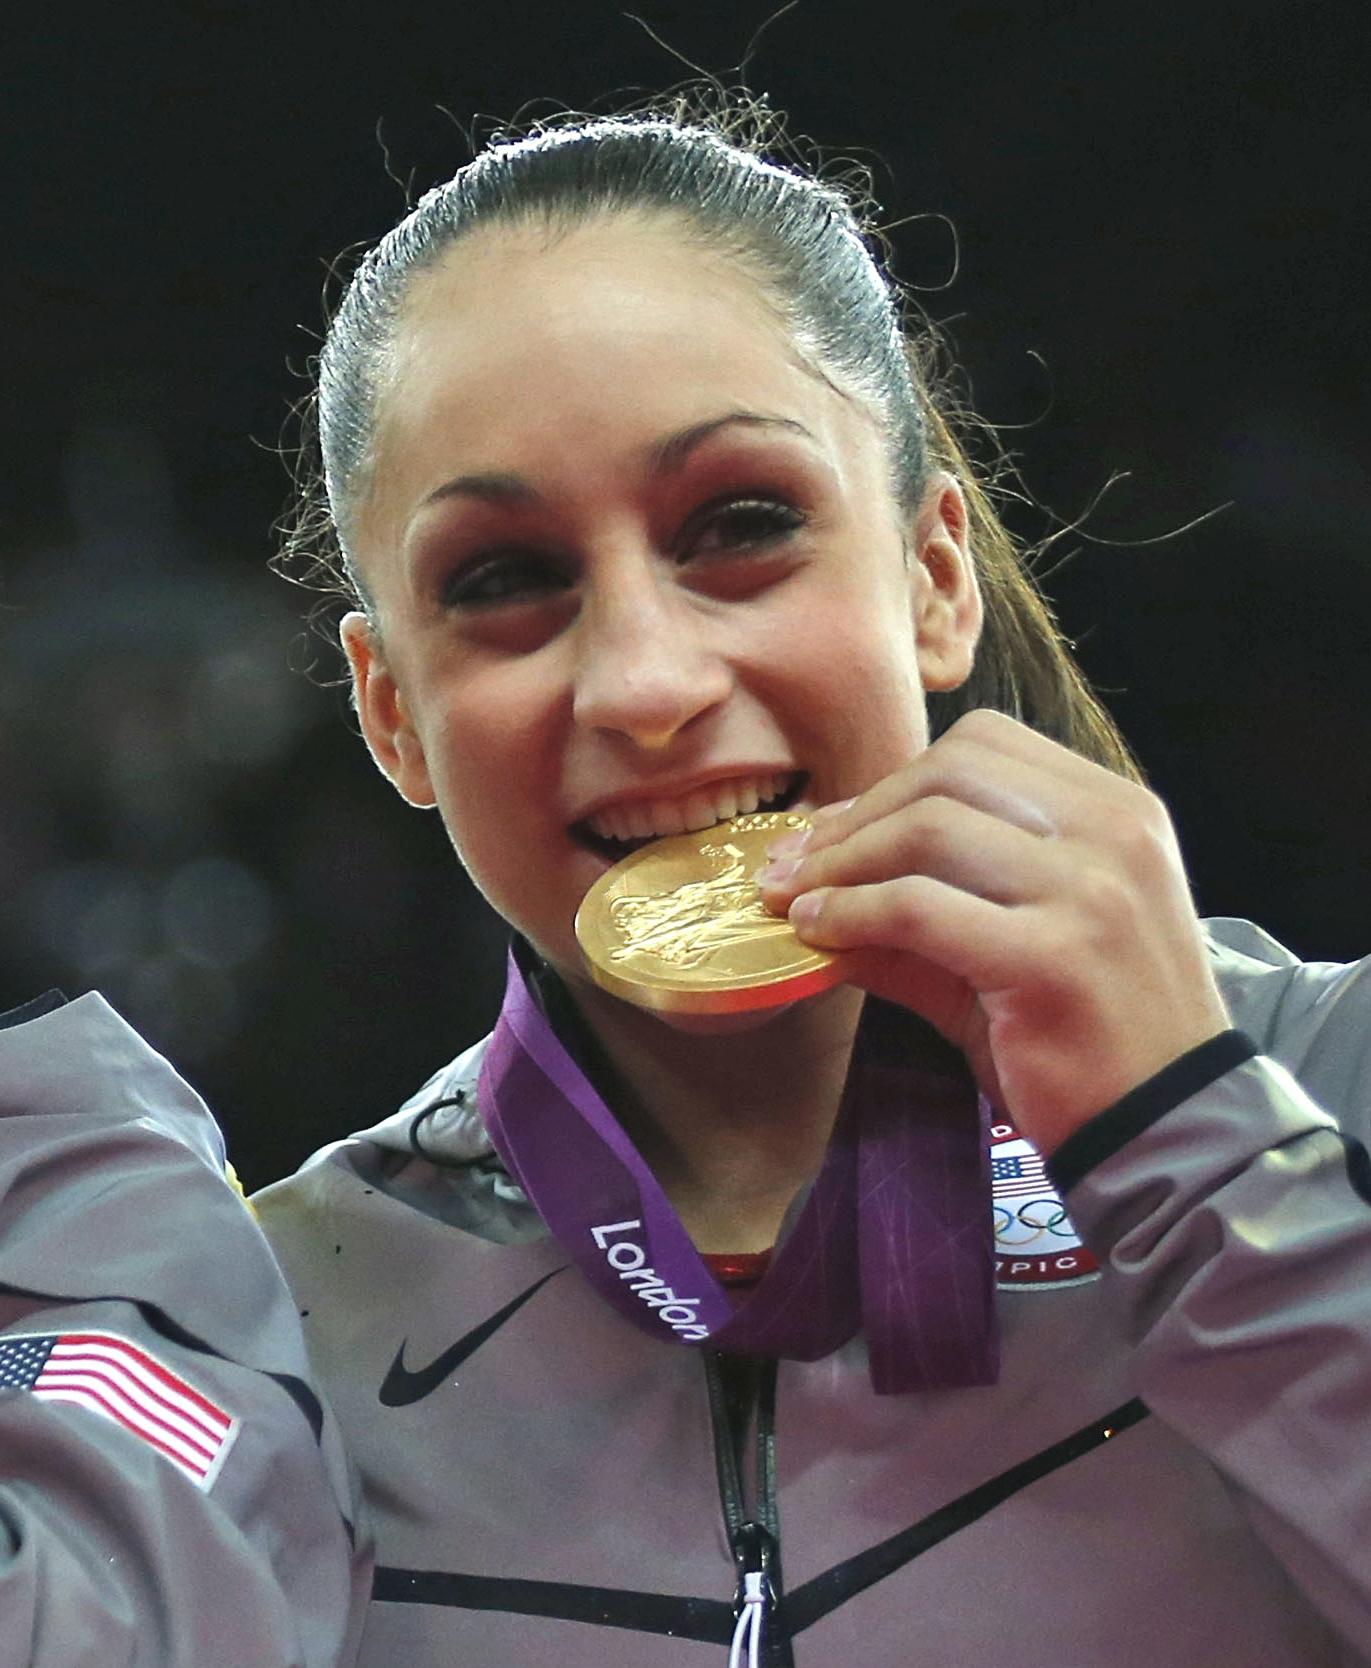 Designall20 July 2012: Gold Medalist Jordyn Wieber To Lead Arkansas Gymnastics